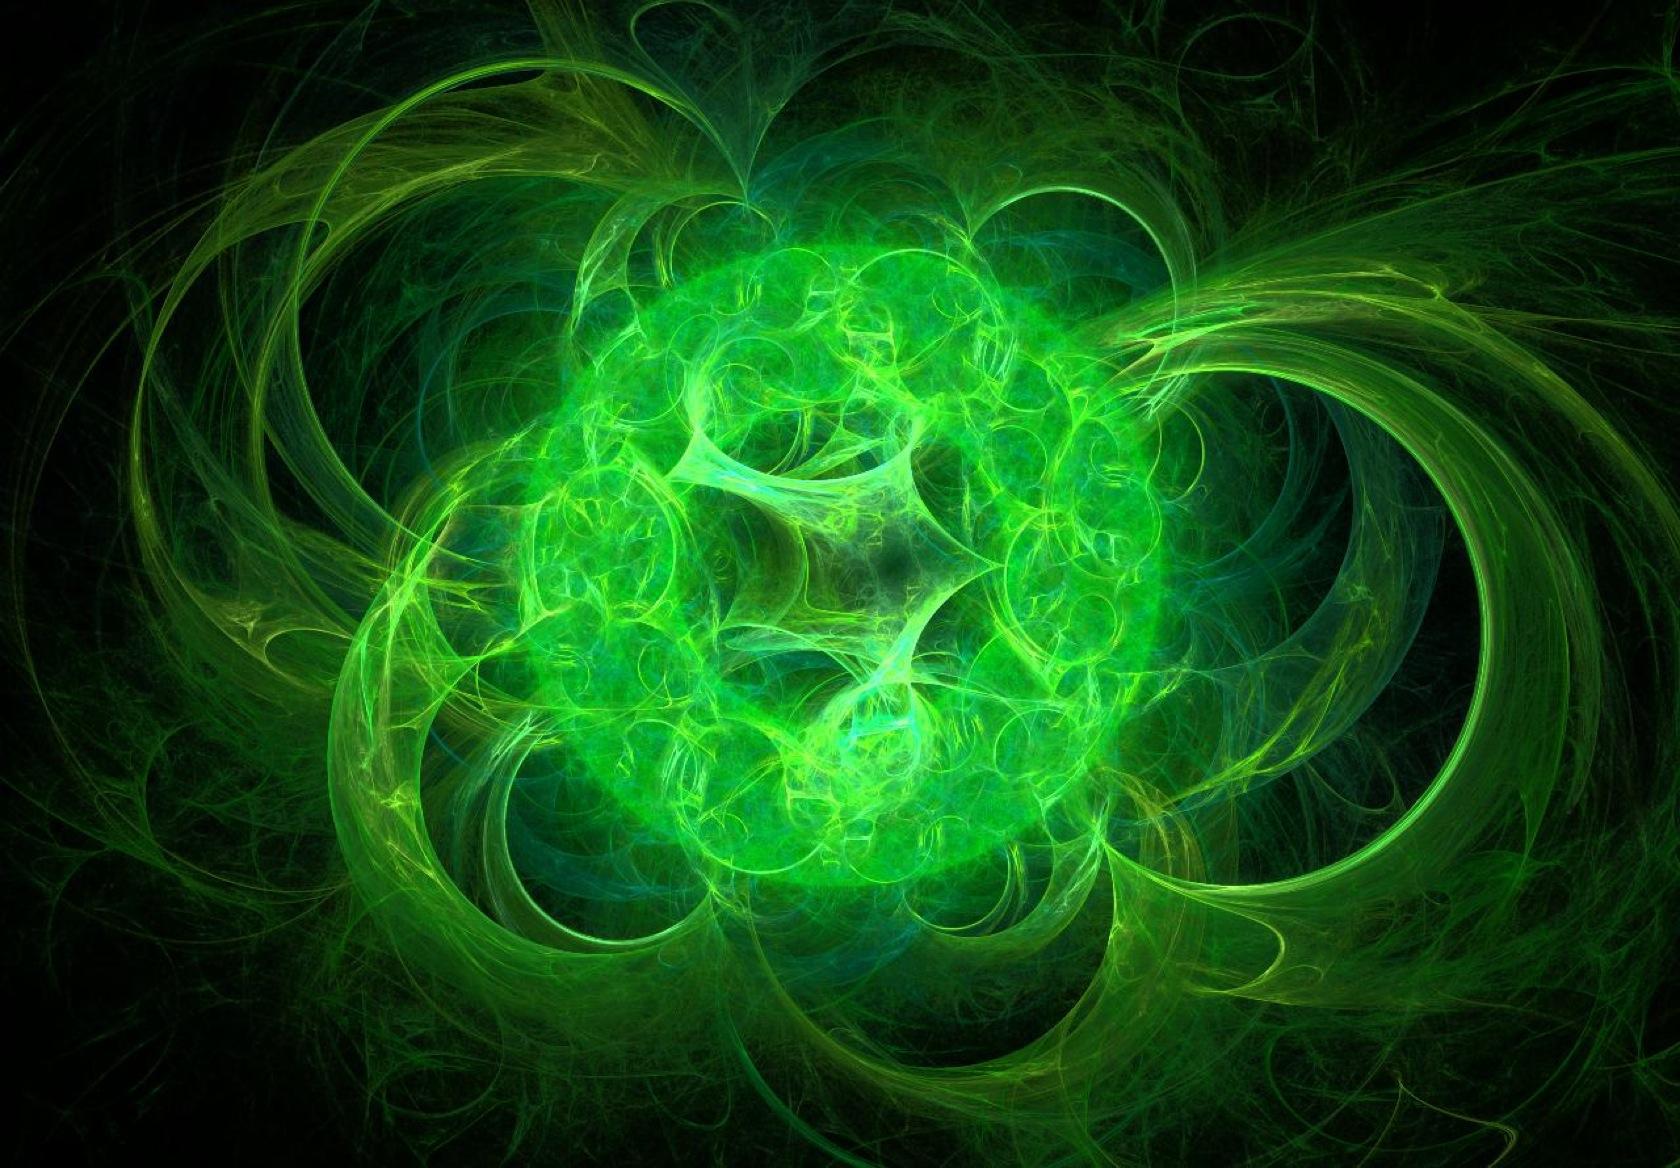 картинки кислотно зеленого цвета работе